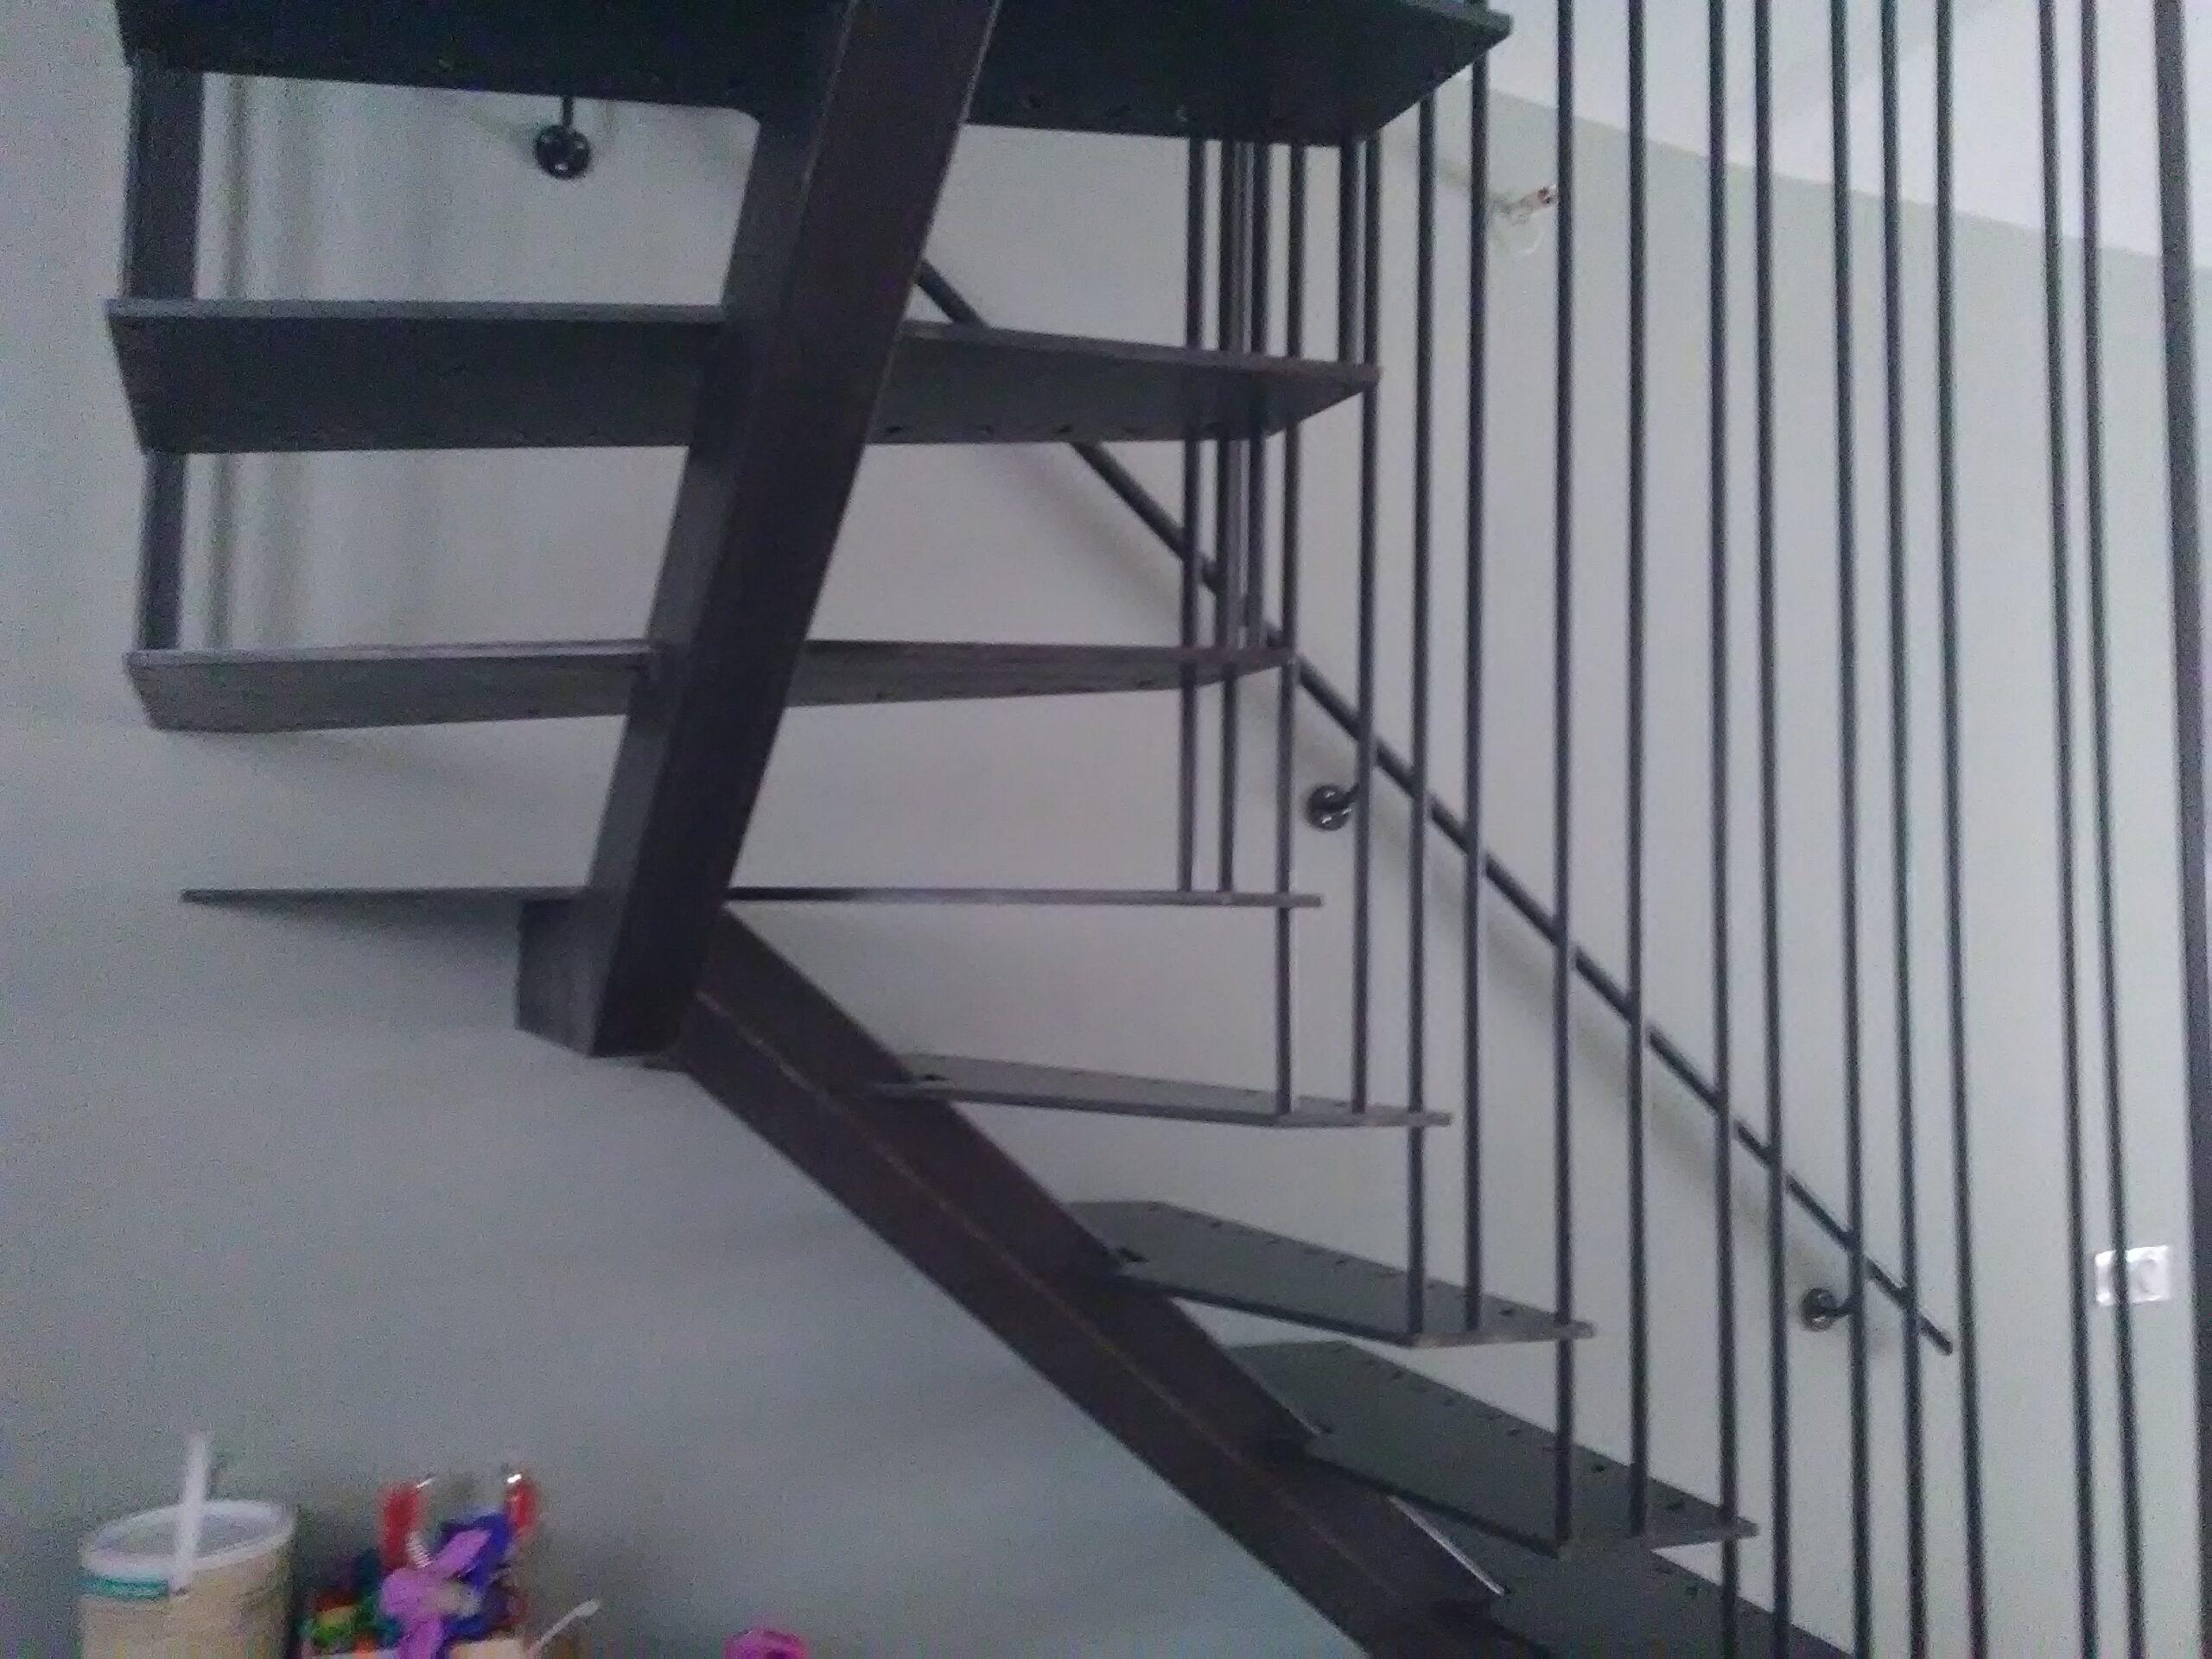 https://www.mon-artisan-ferronnier.com/wp-content/uploads/2021/04/escalier17-1-scaled.jpeg